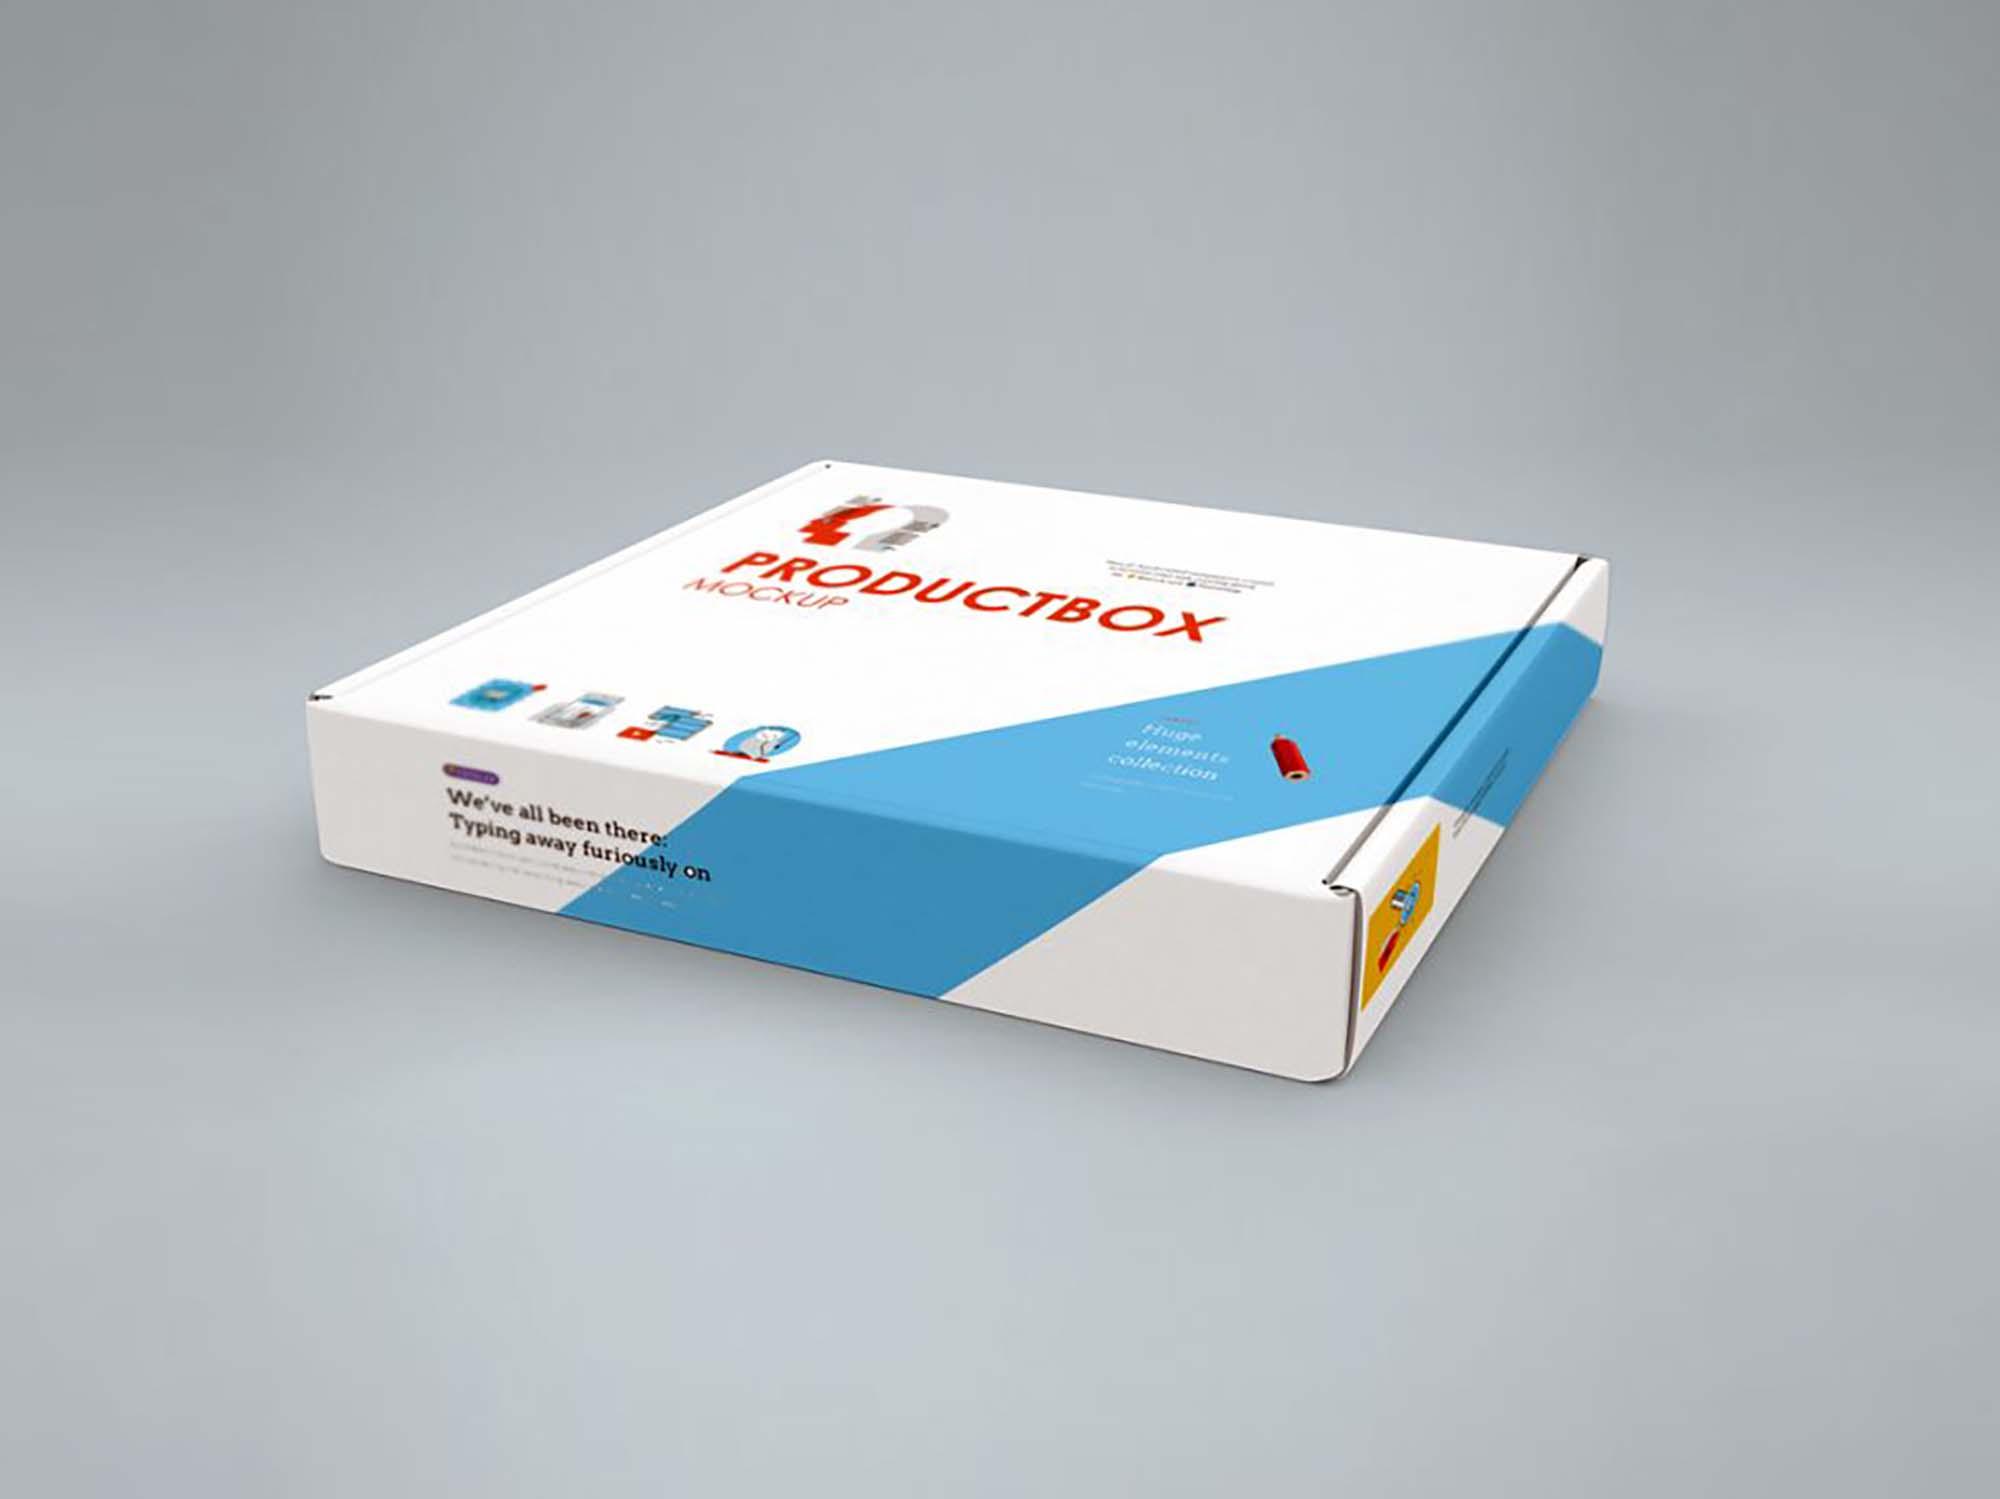 Horizontal Box Cover Mockup